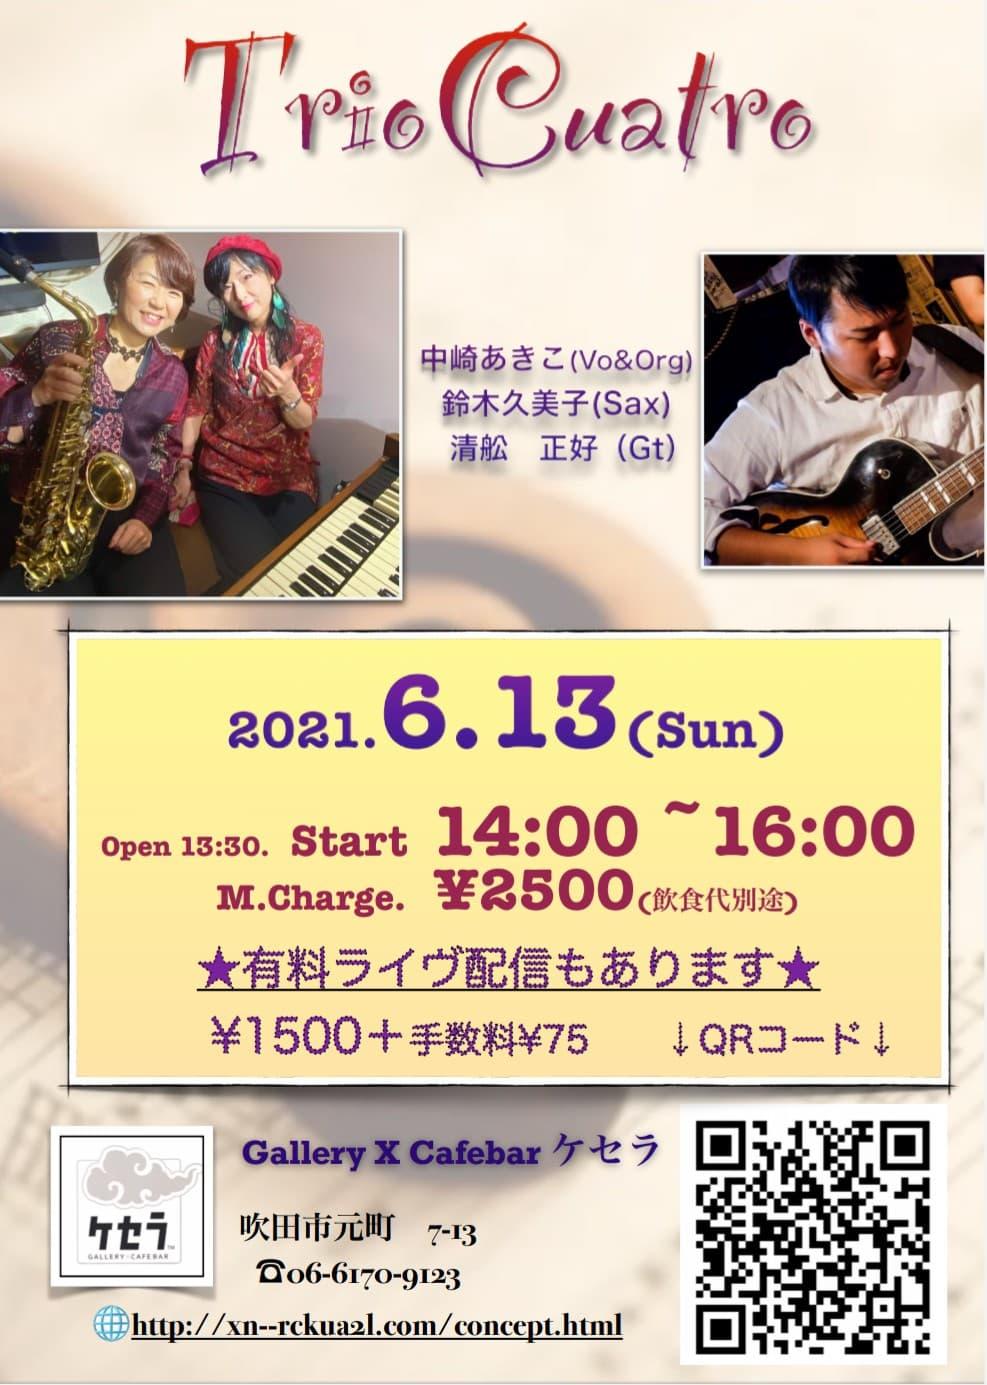 21/6/13 Trio Cuatro (無観客配信になりました)